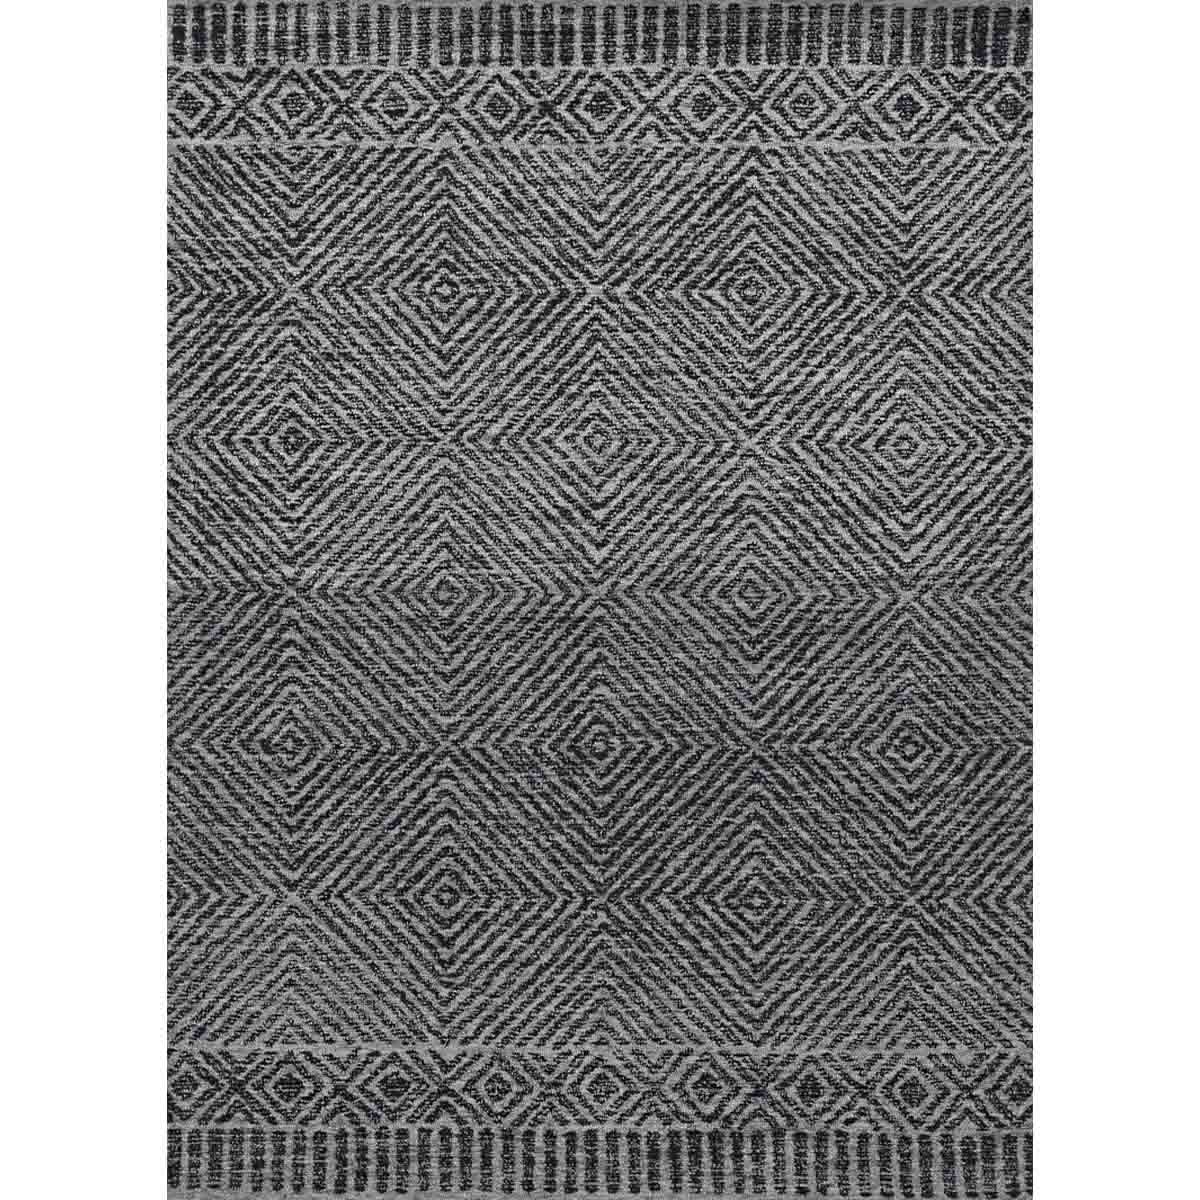 KAS 5 ft. x 7 ft. Hudson Grey/Black Retreat Area Rug